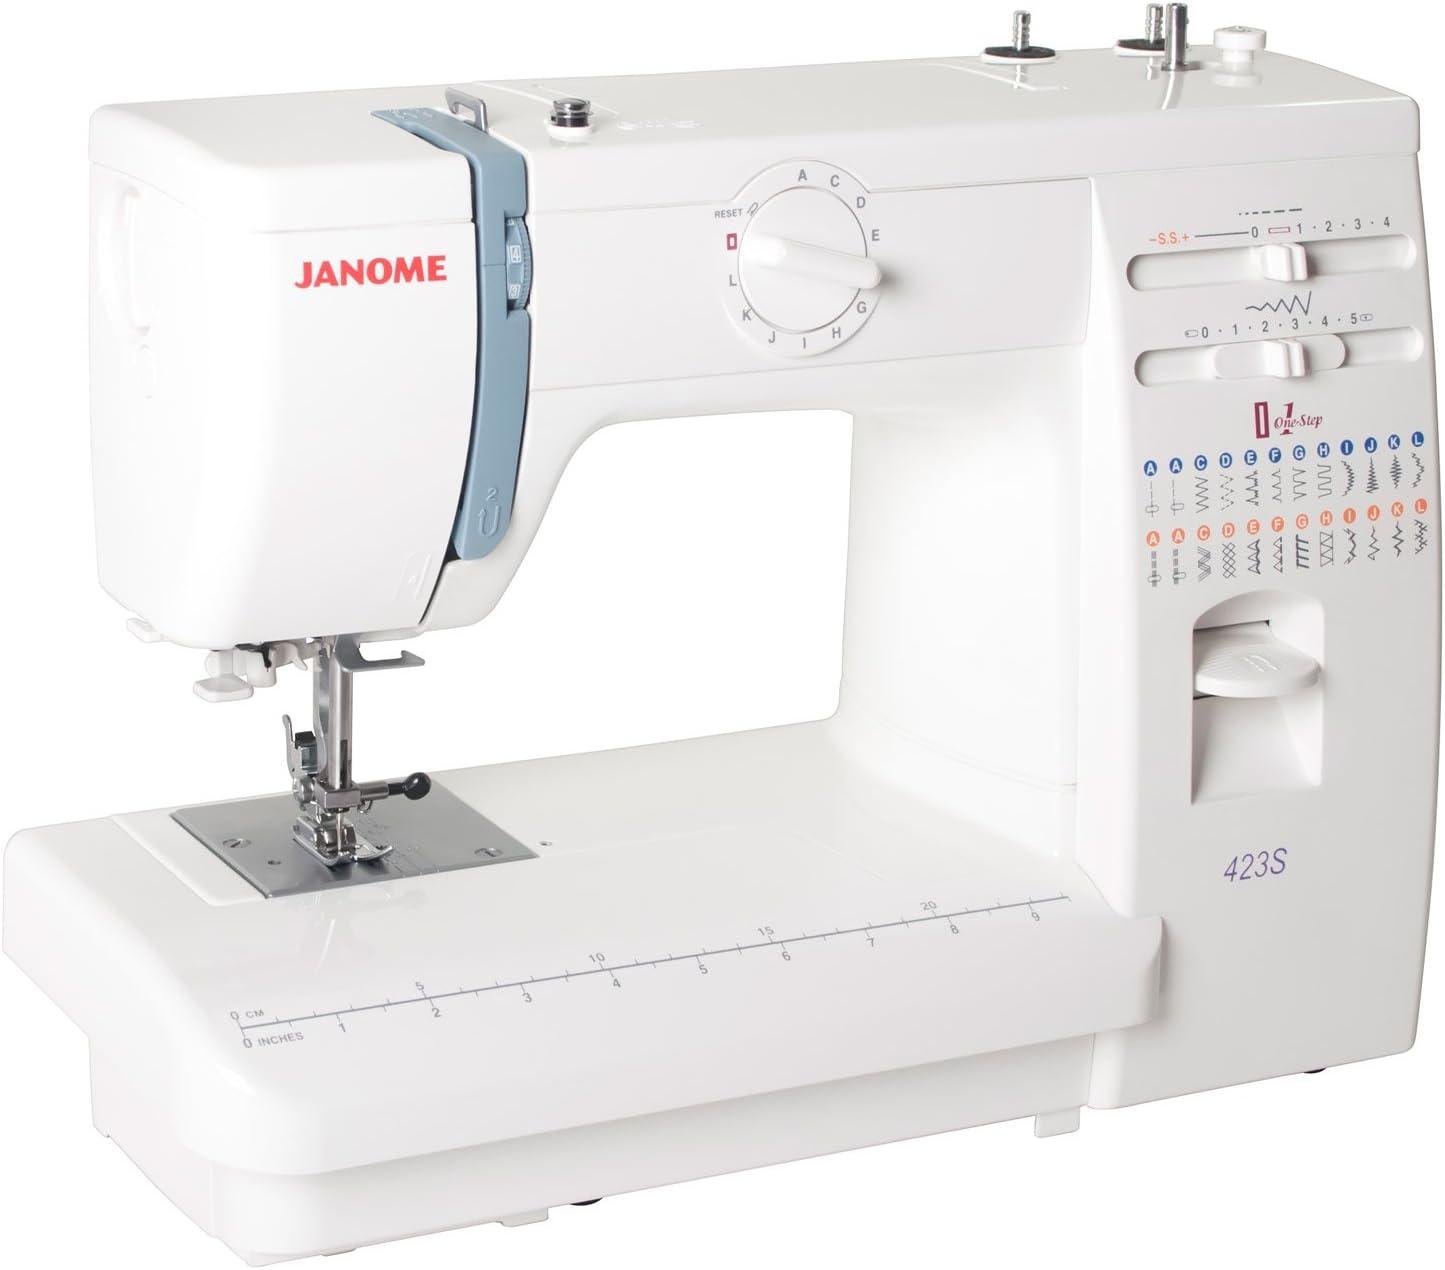 Janome - Máquina de Coser 423S Mecánica: Amazon.es: Hogar